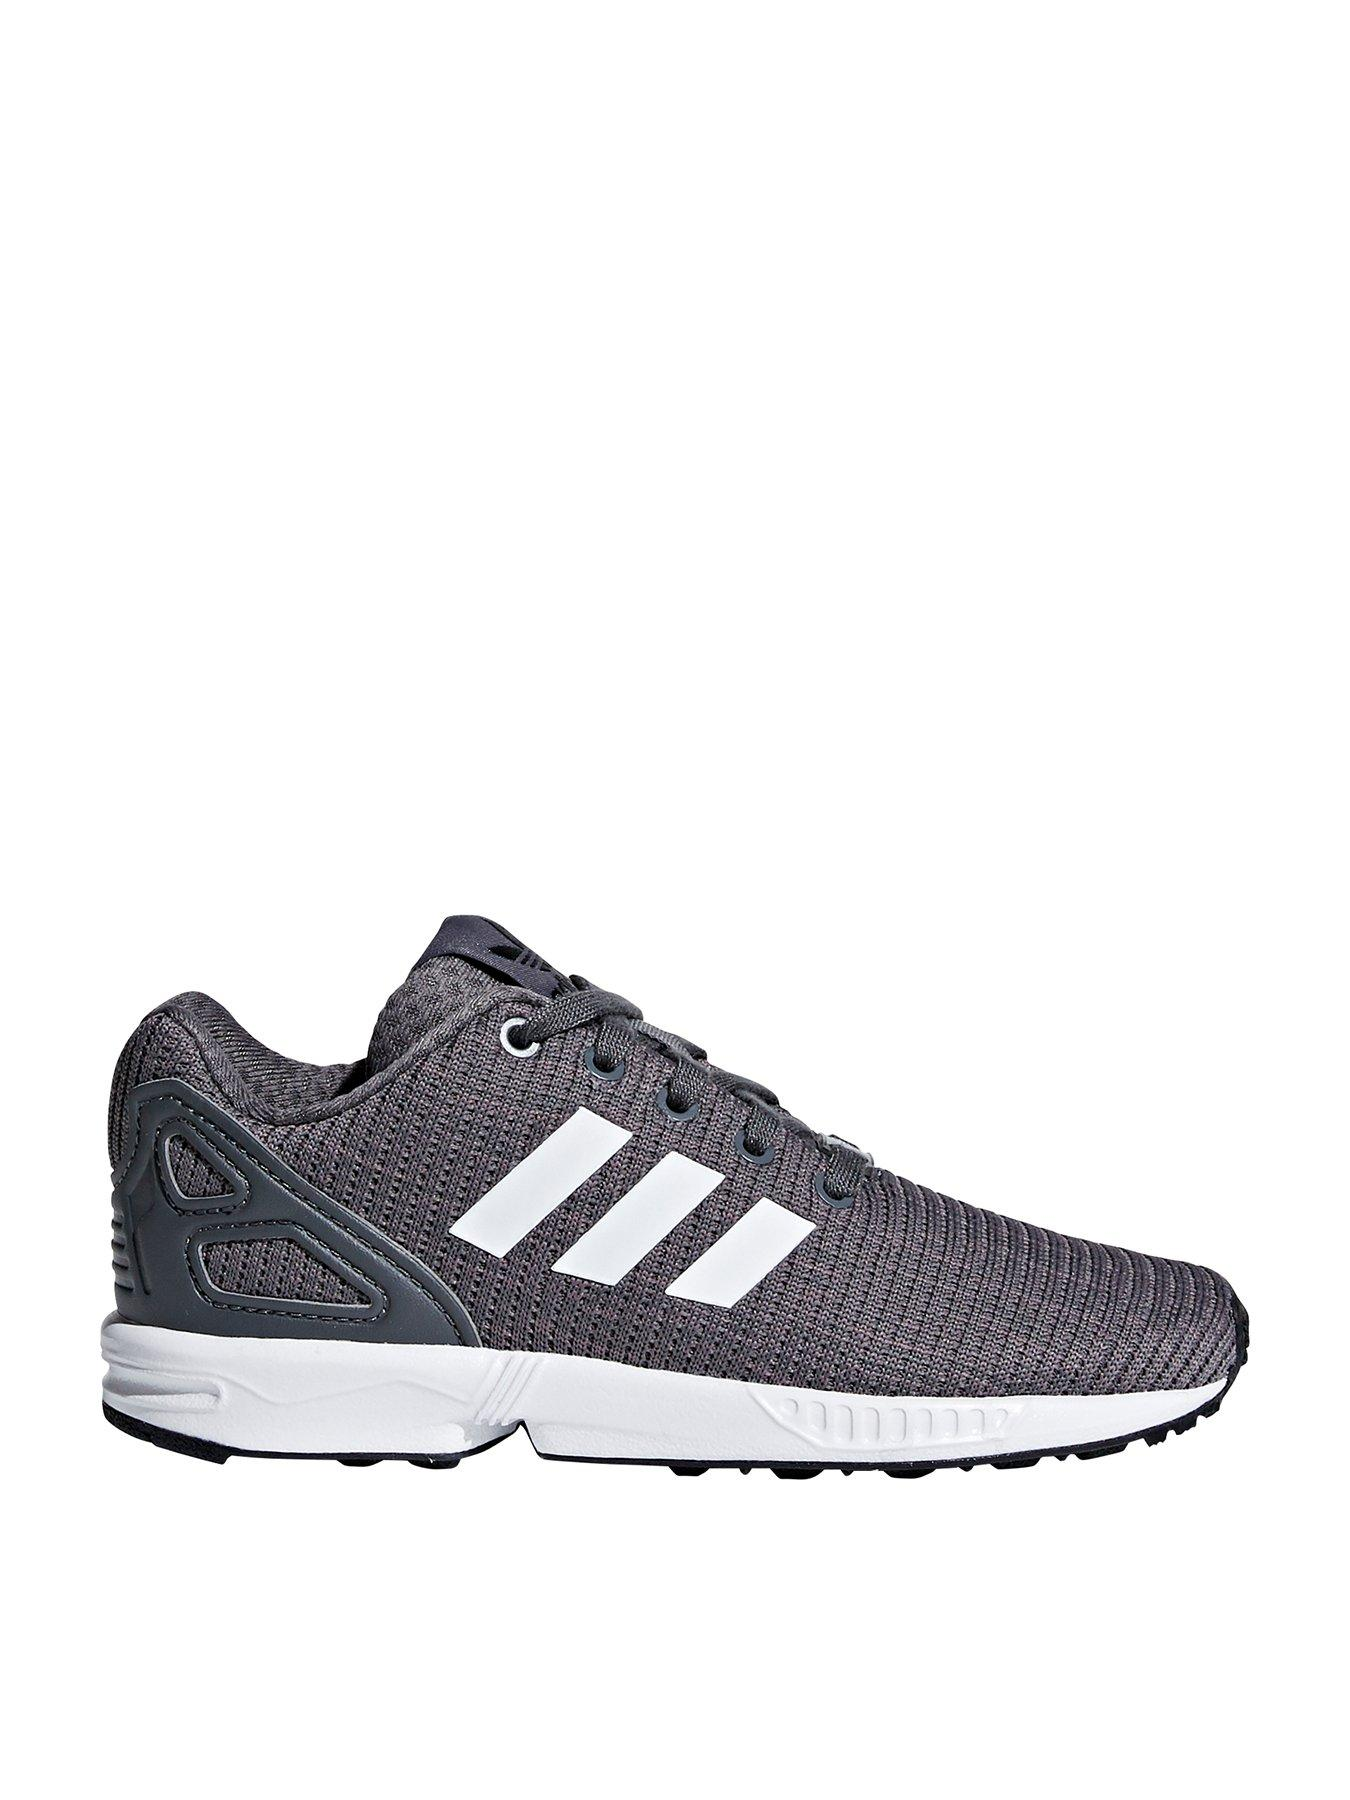 adidas Originals Adidas Originals ZX Flux Childrens Trainer